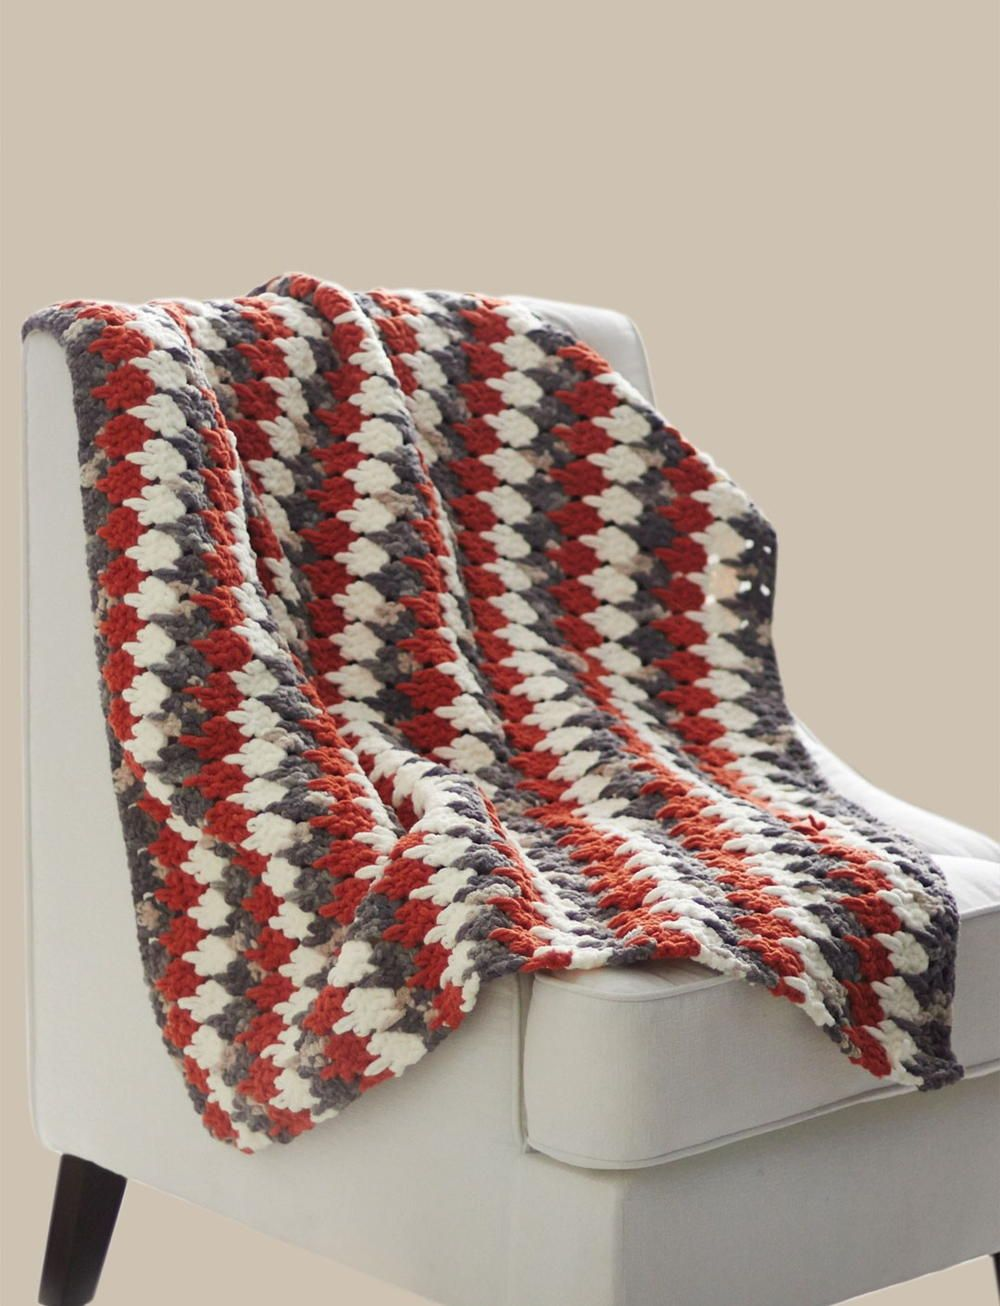 Larksfoot Crochet Blanket | Sofá, Manta y Camas